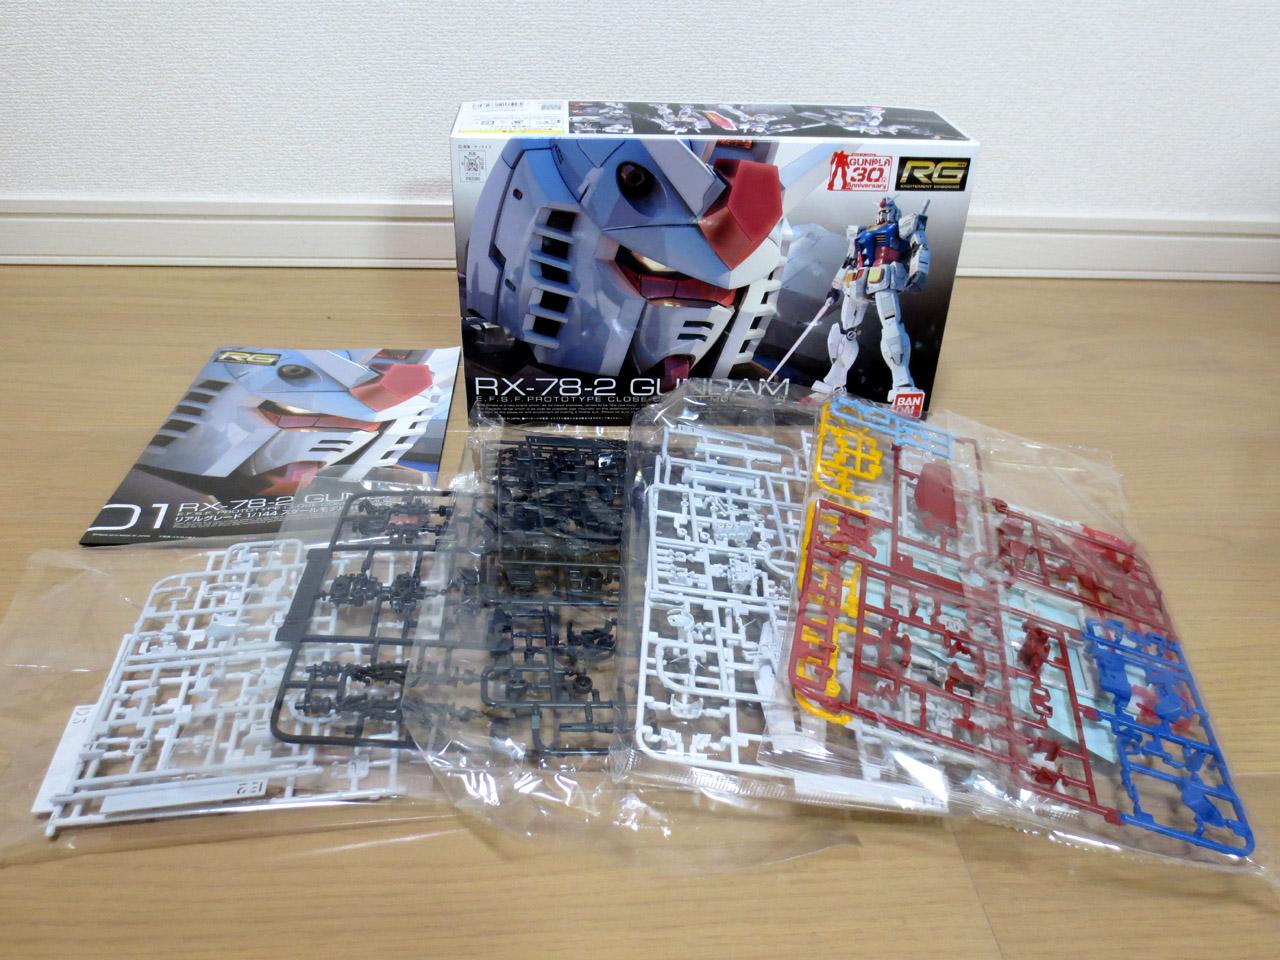 RG_RX78_2_Gundam_04.jpg